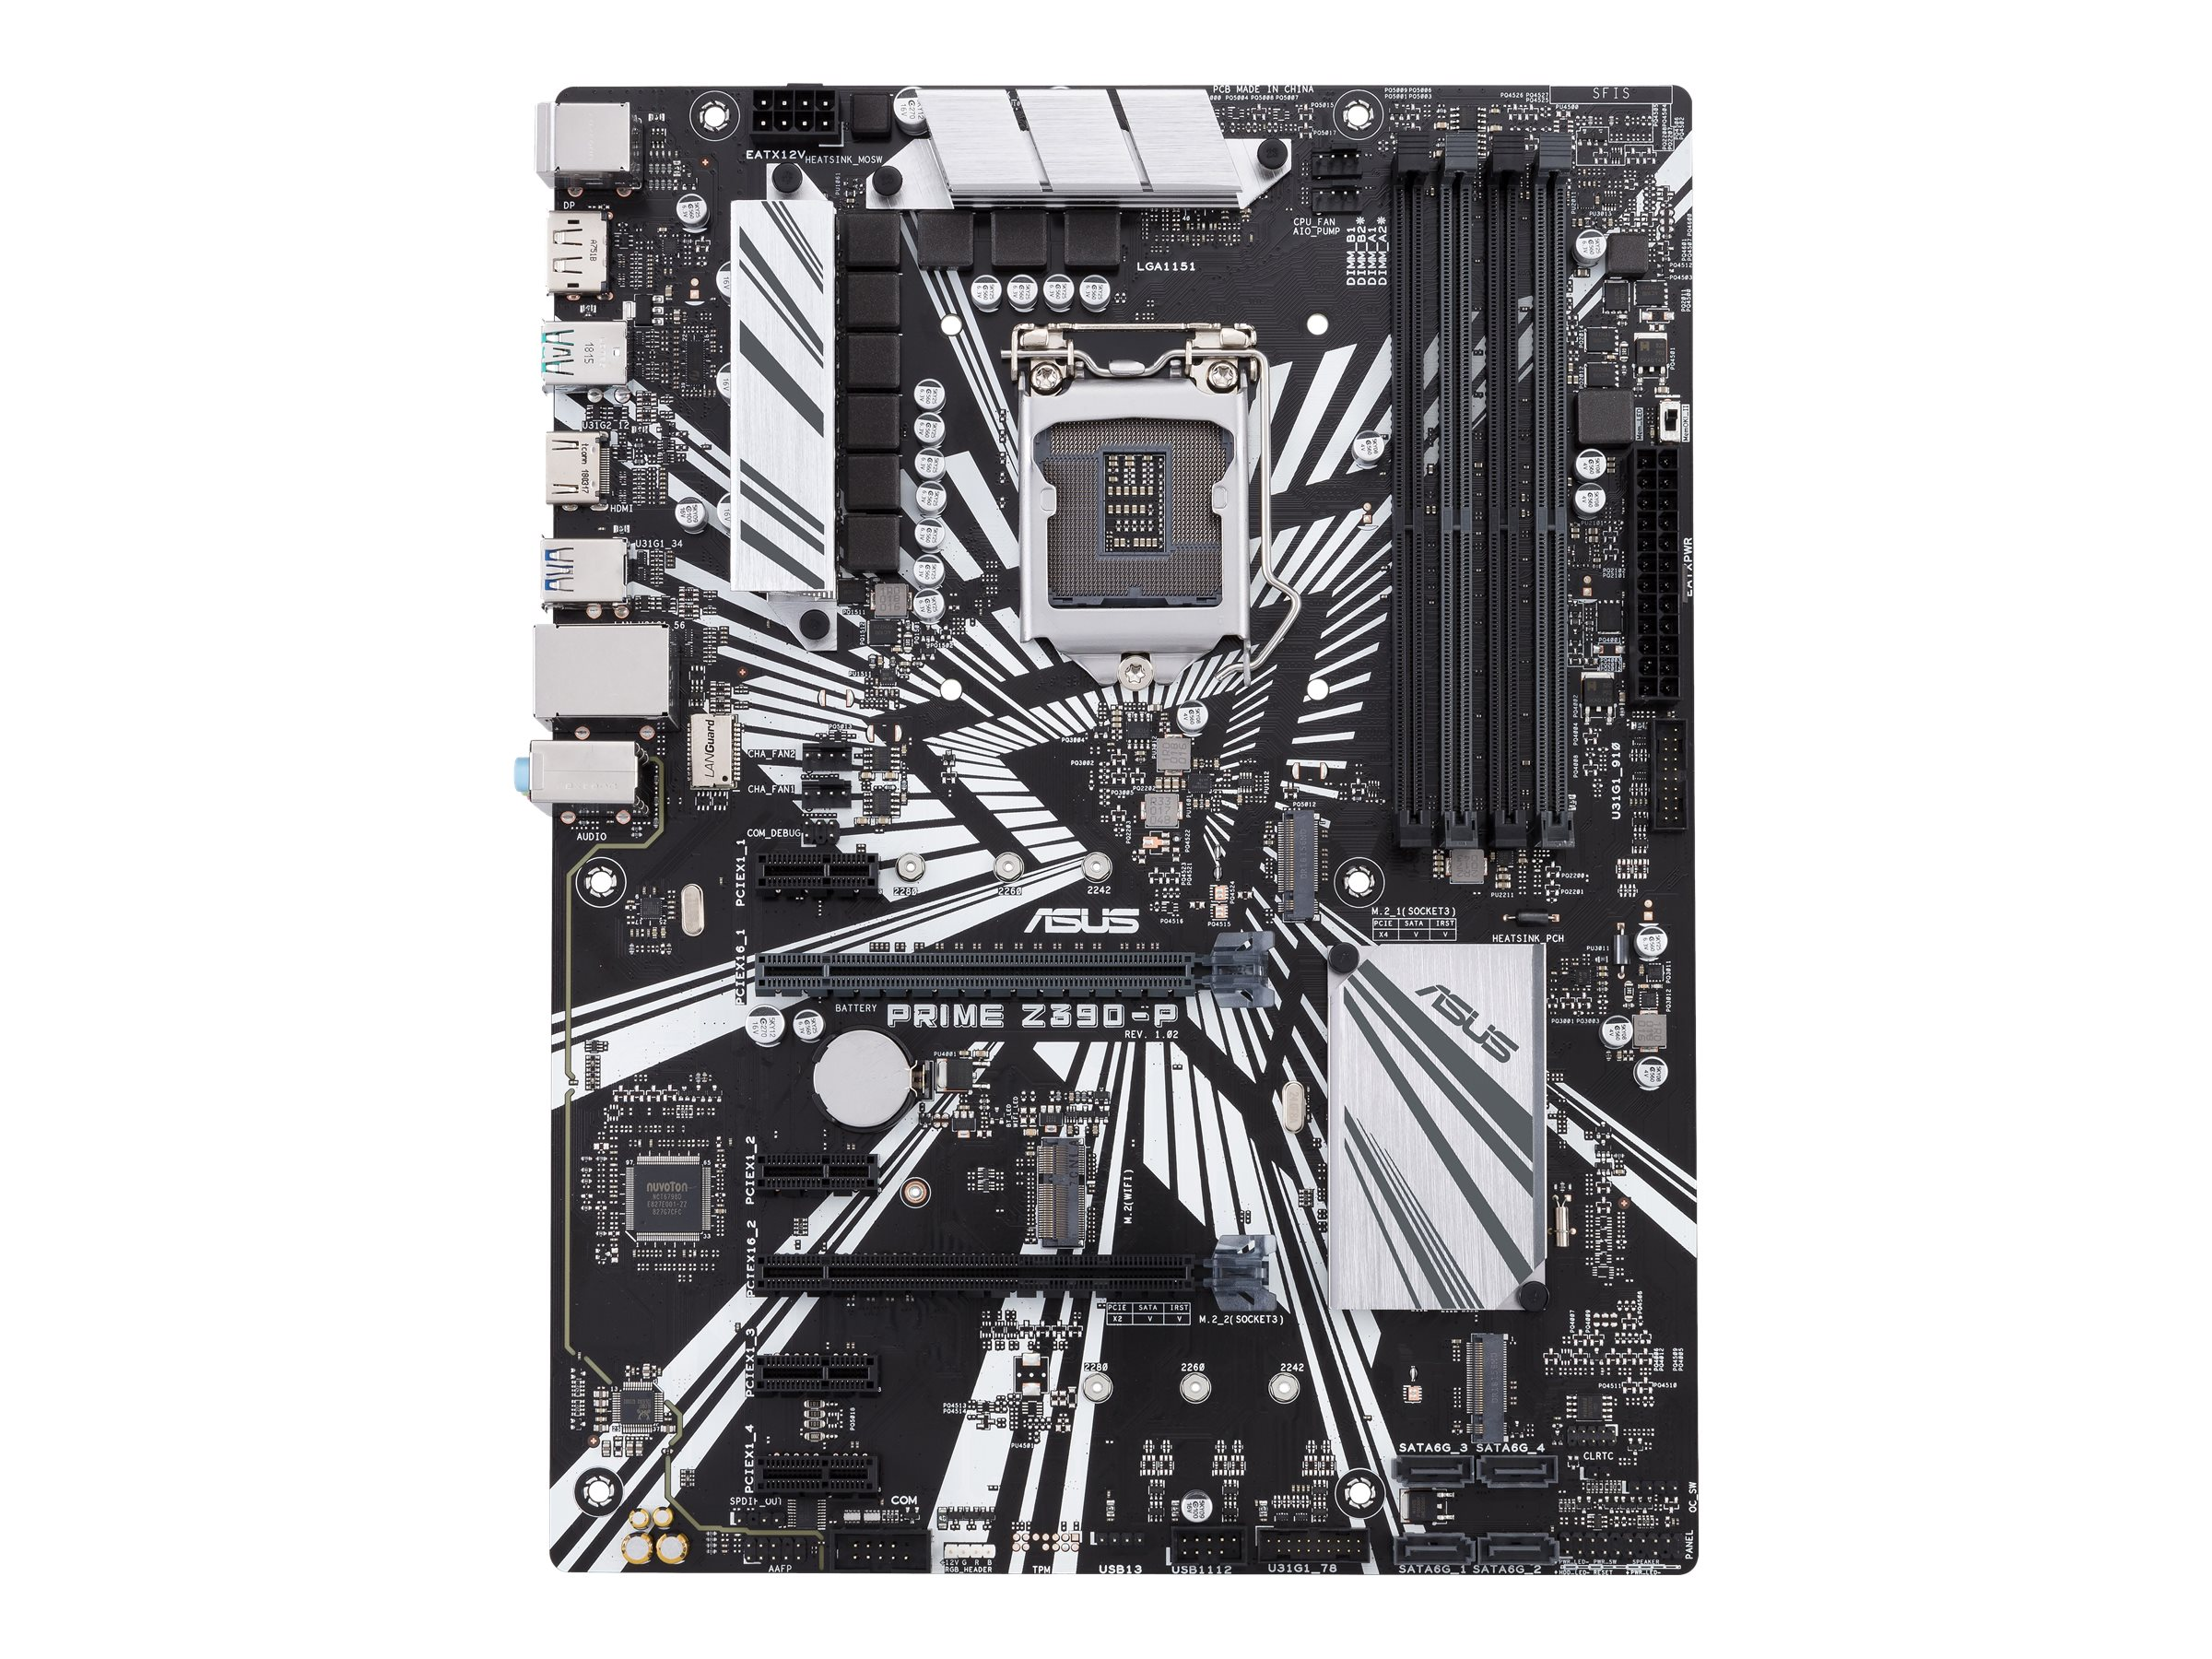 ASUS PRIME Z390-P - Motherboard - ATX - LGA1151 Socket - Z390 Chipsatz - USB 3.1 Gen 1, USB 3.1 Gen 2